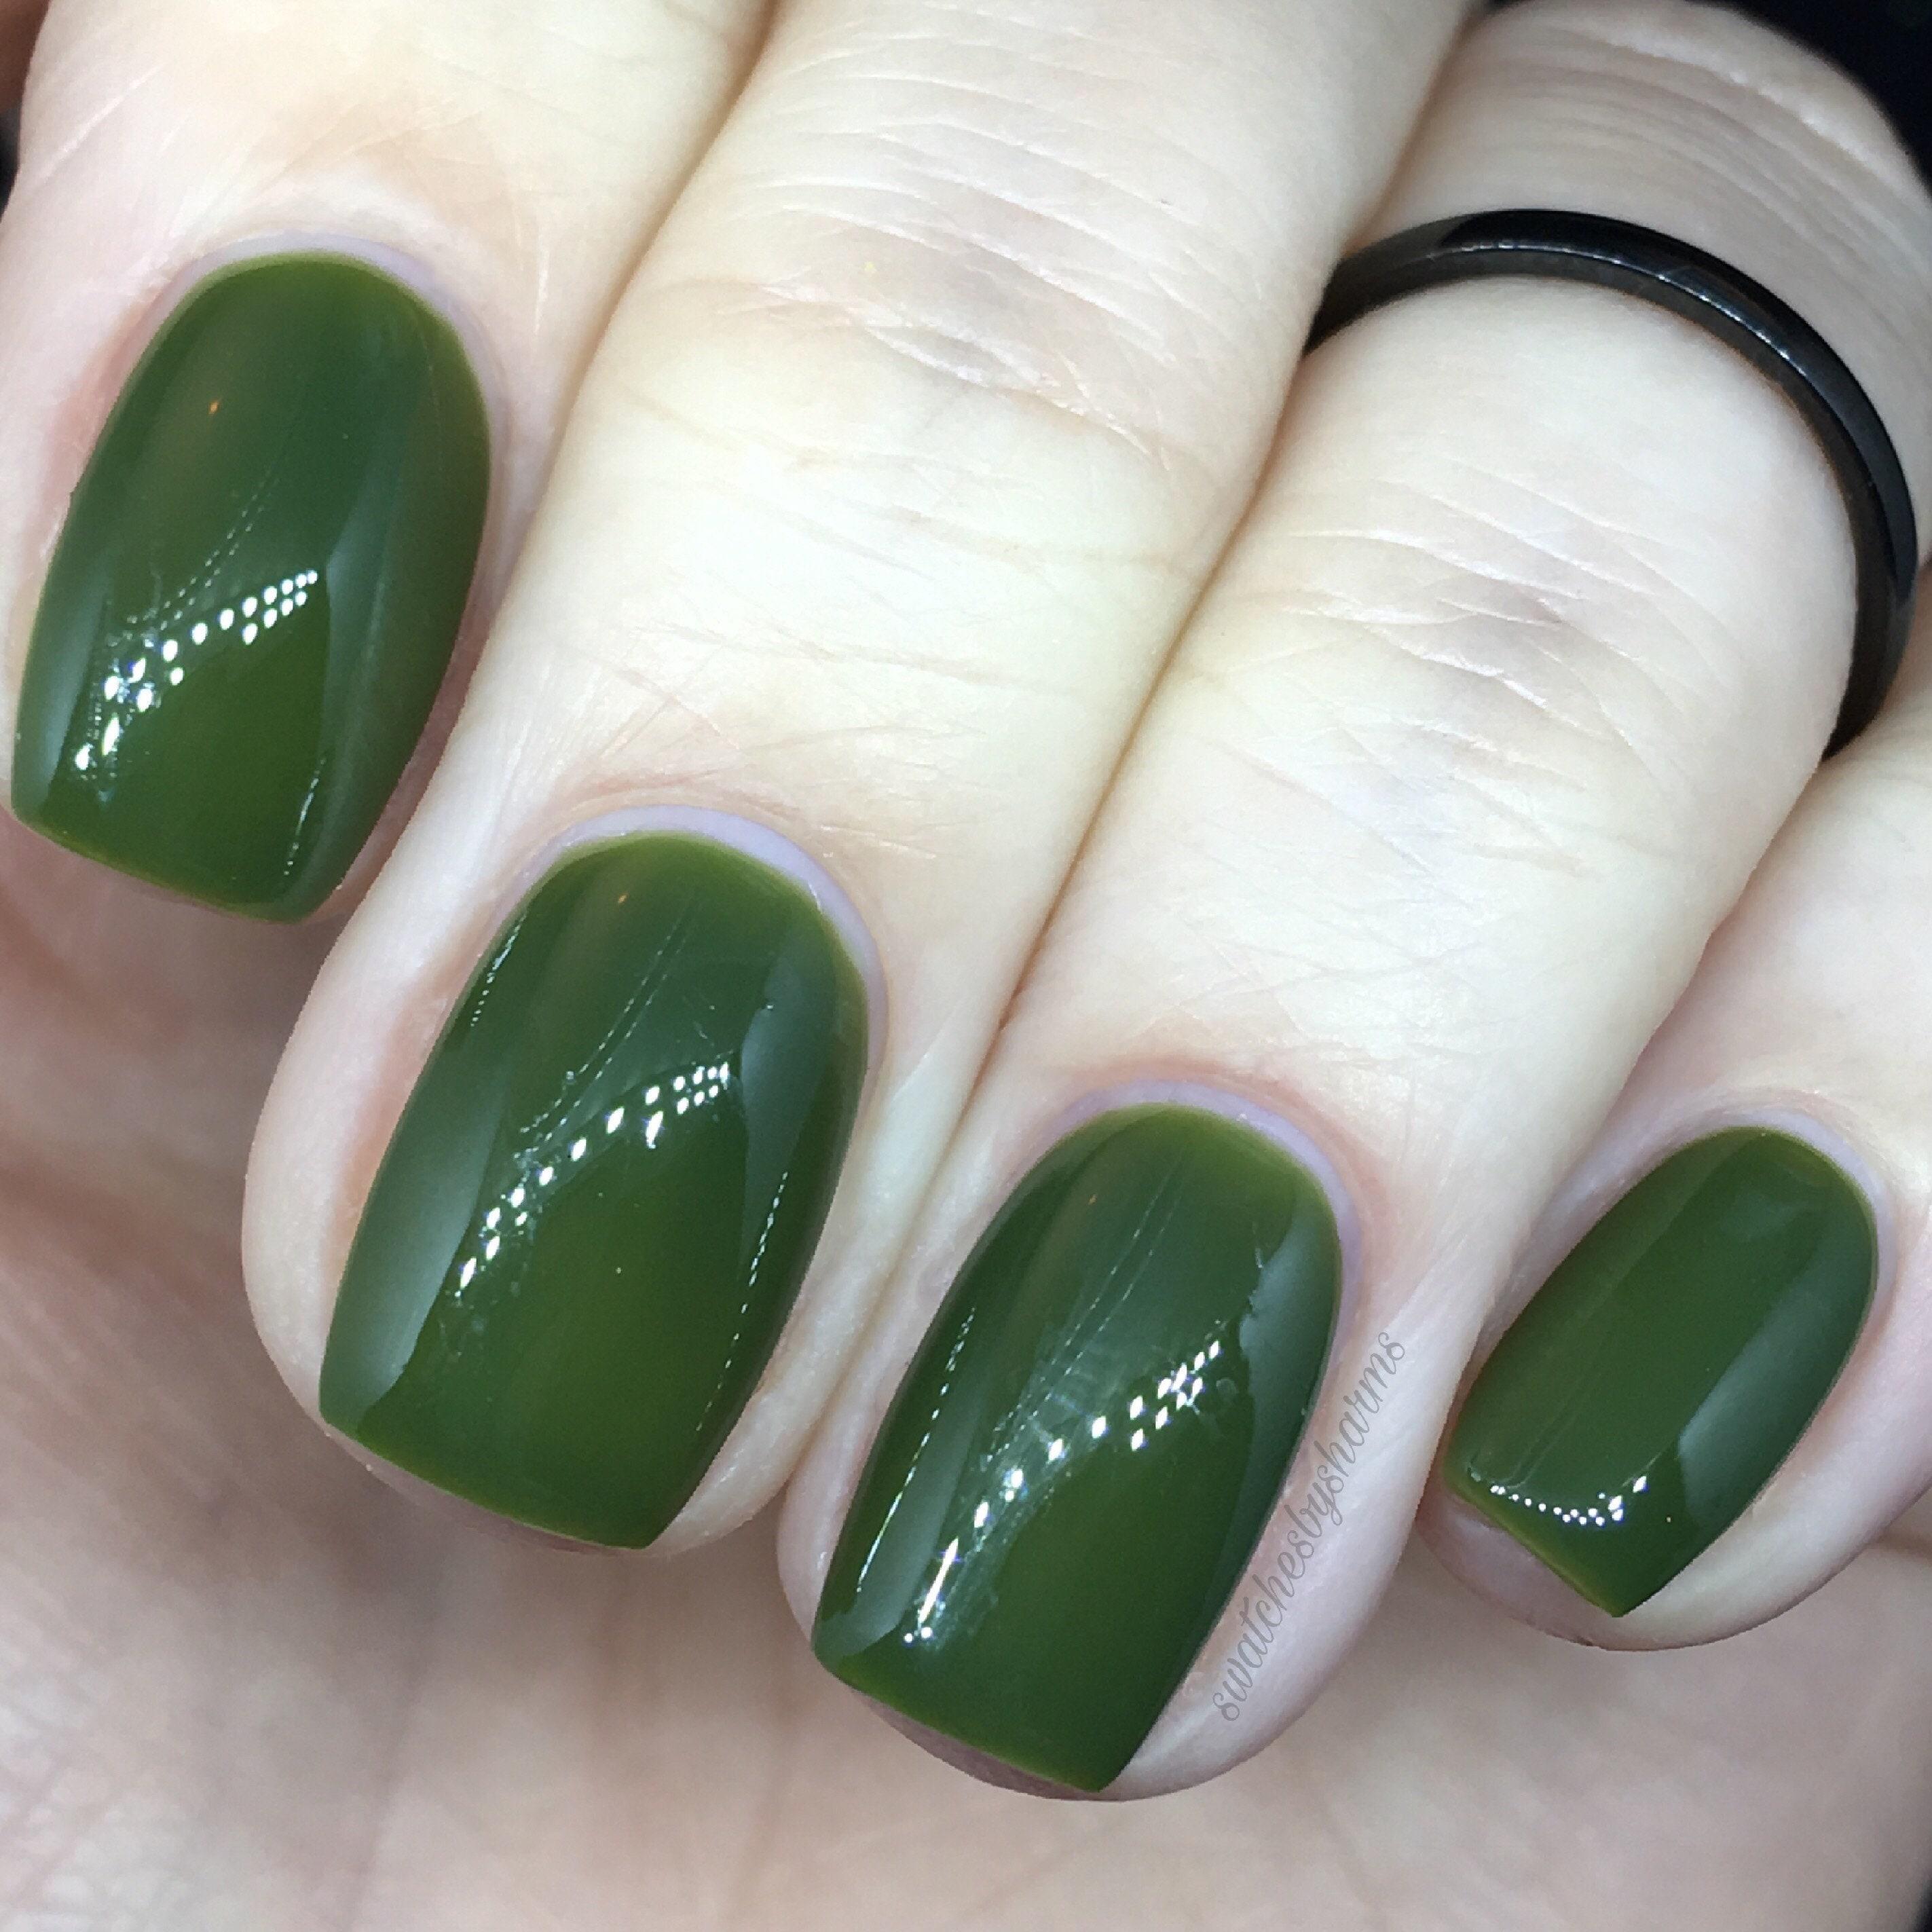 Paranoid Android Nail Polish olive, green, army, cream